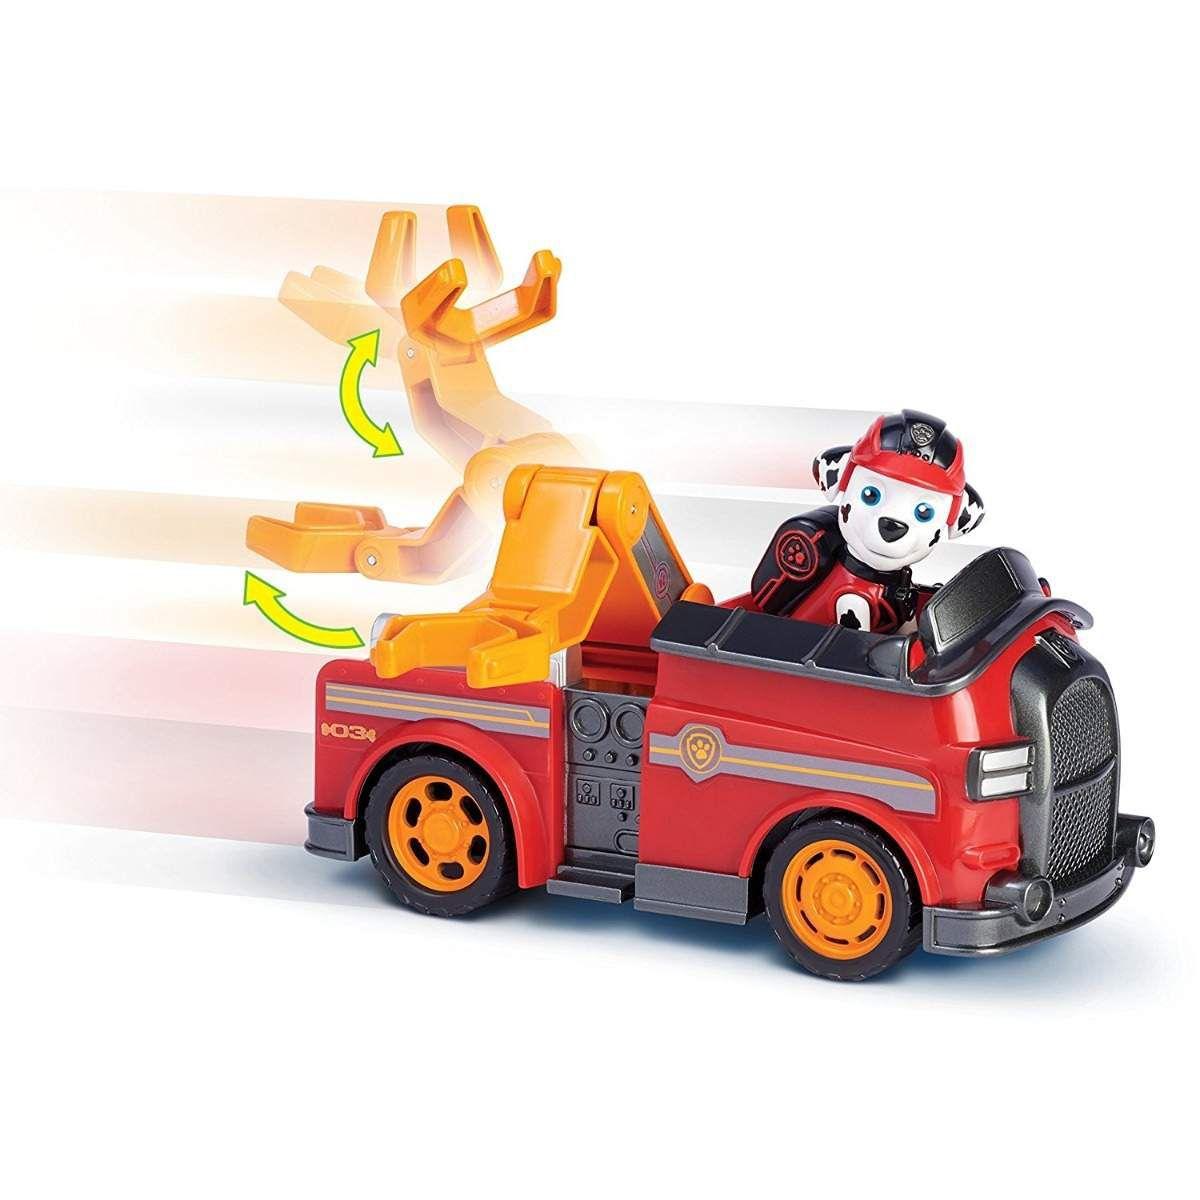 Brinquedo Patrulha Canina Mission Paw Boneco Veiculo Marshall - Sunny